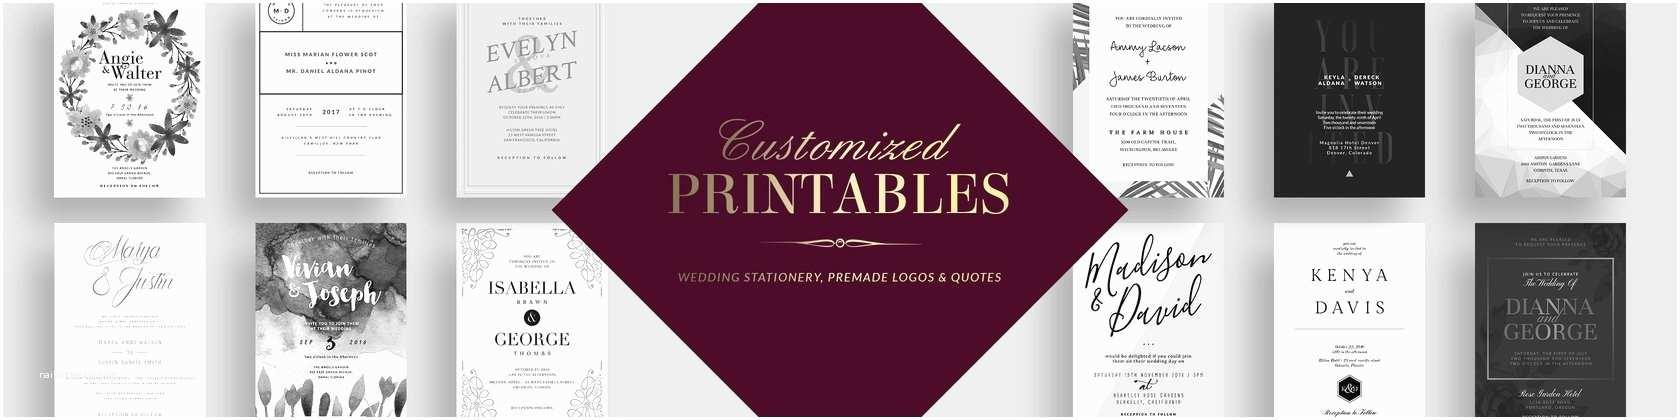 Premade Wedding Invitations Printable Wedding Invitations & Premade by